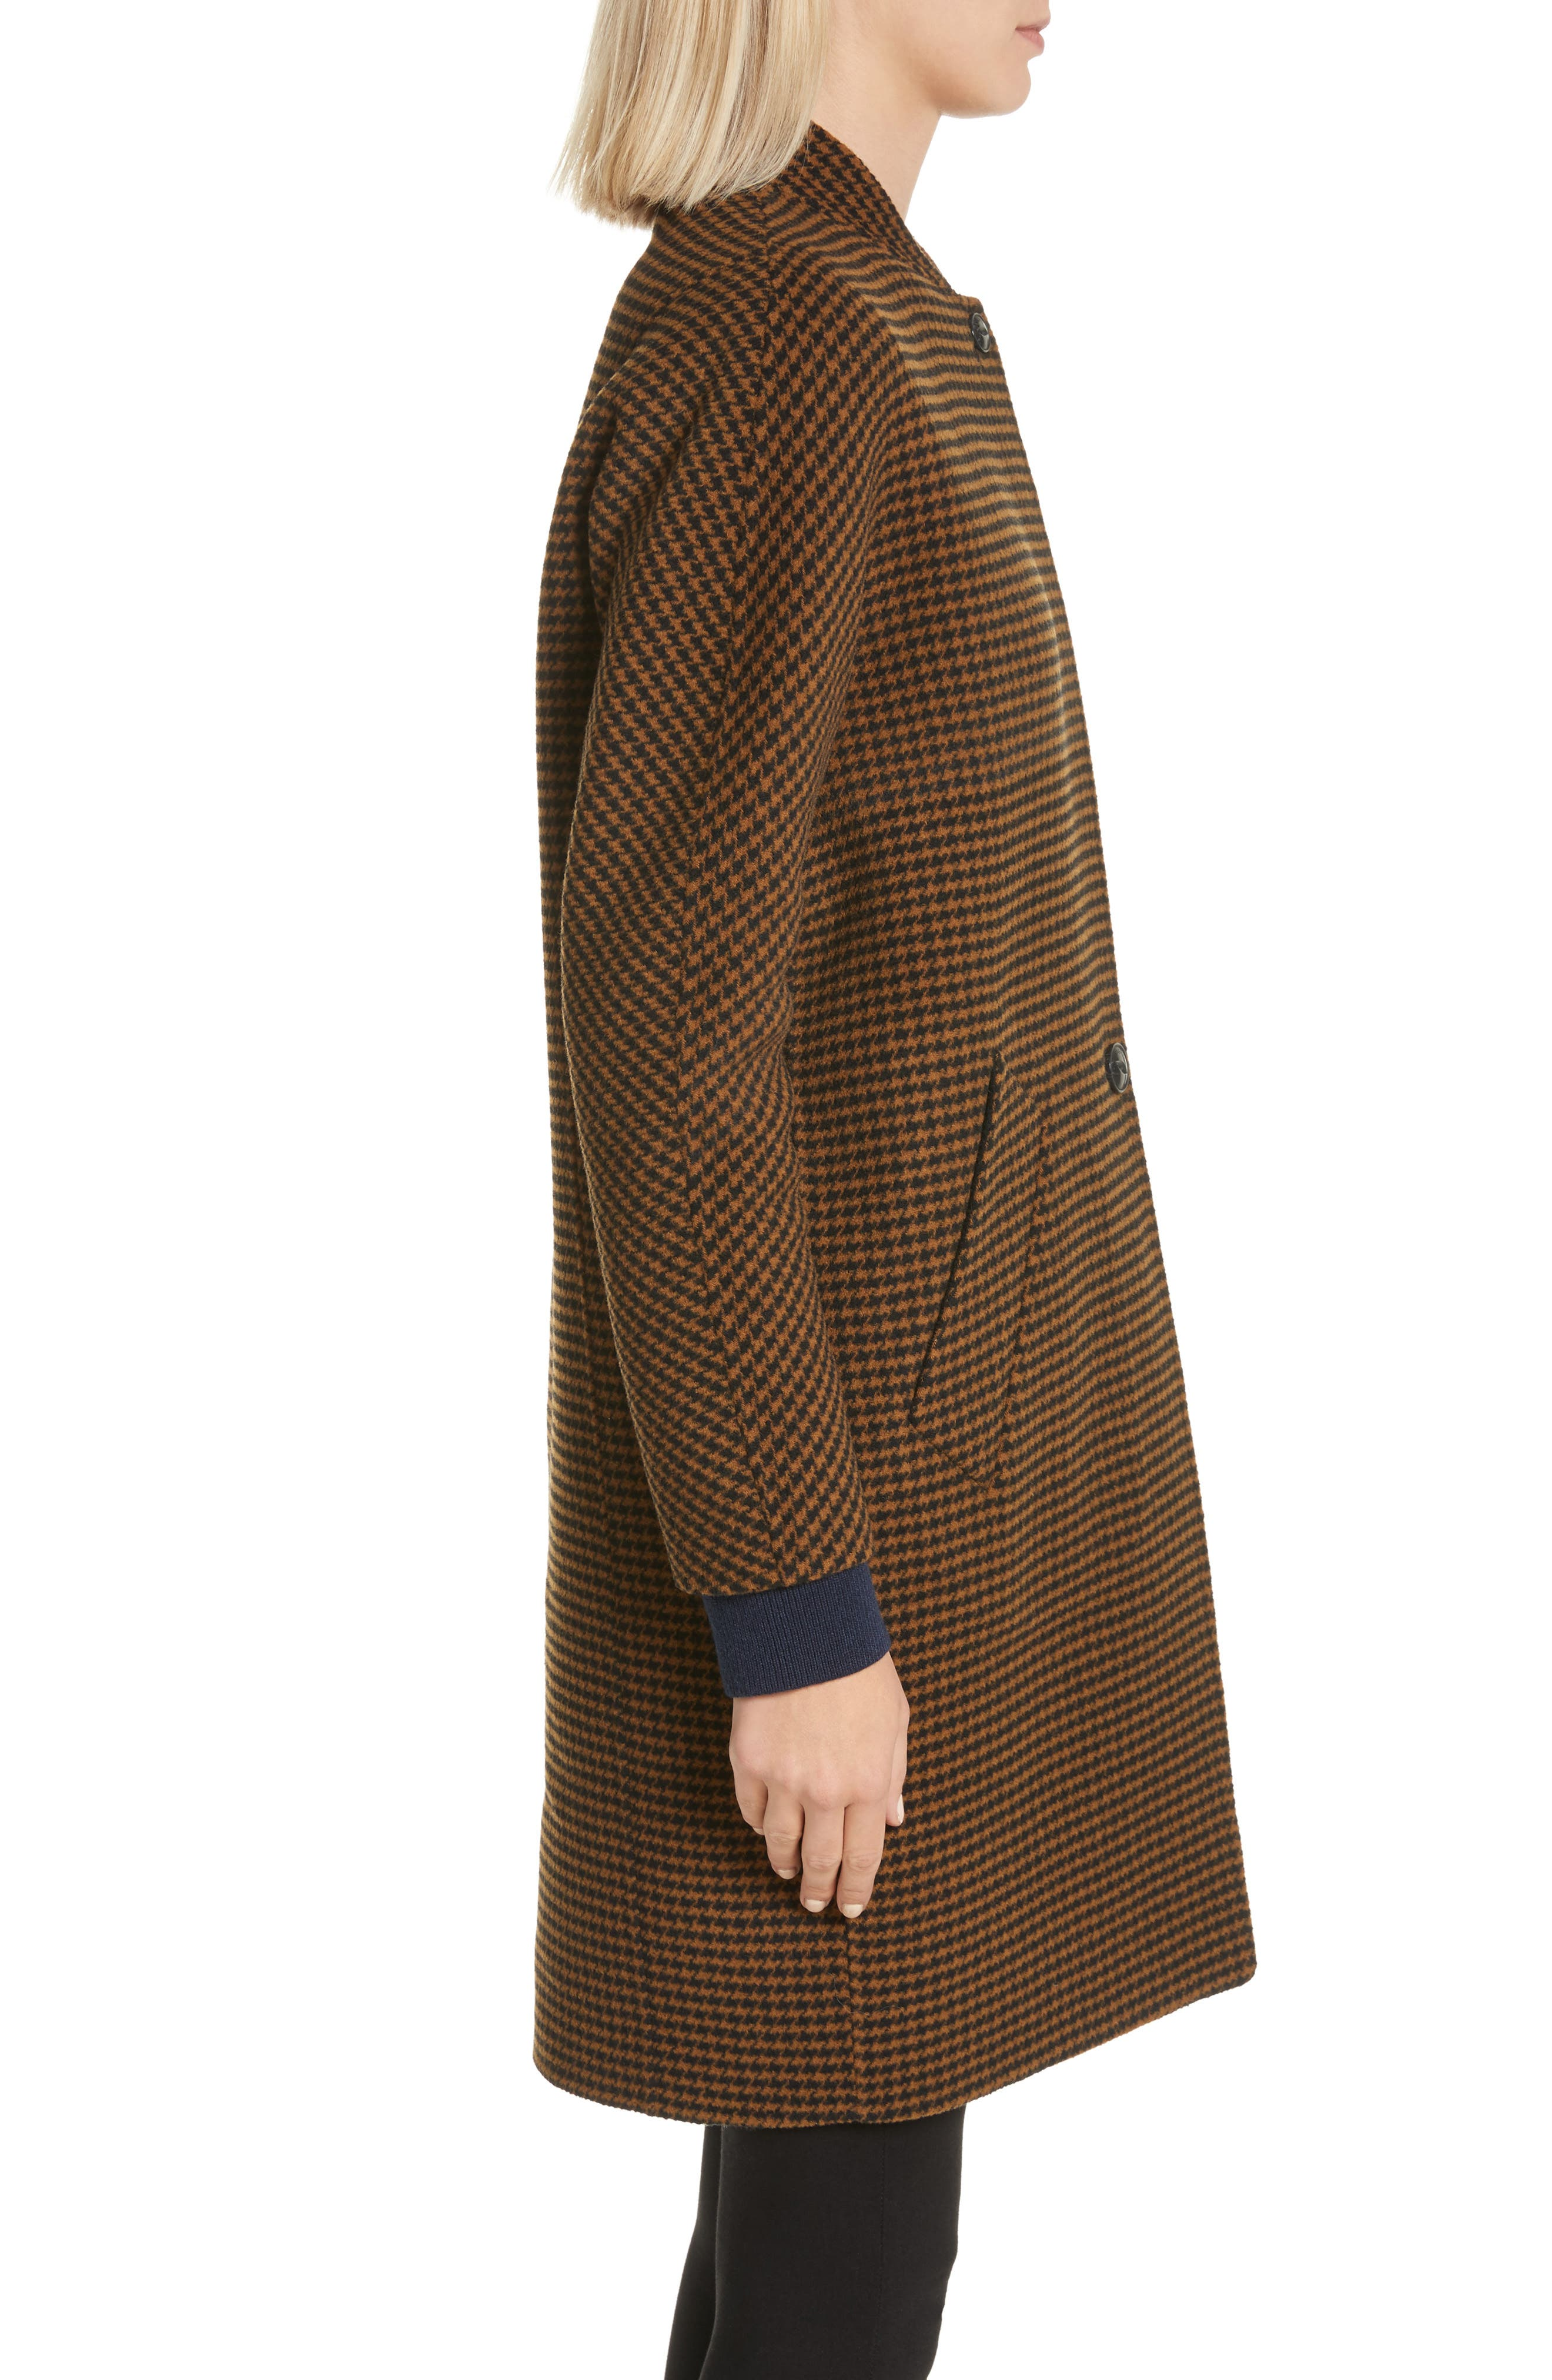 Darwen Reversible Wool & Cashmere Coat,                             Alternate thumbnail 5, color,                             Brown/Black